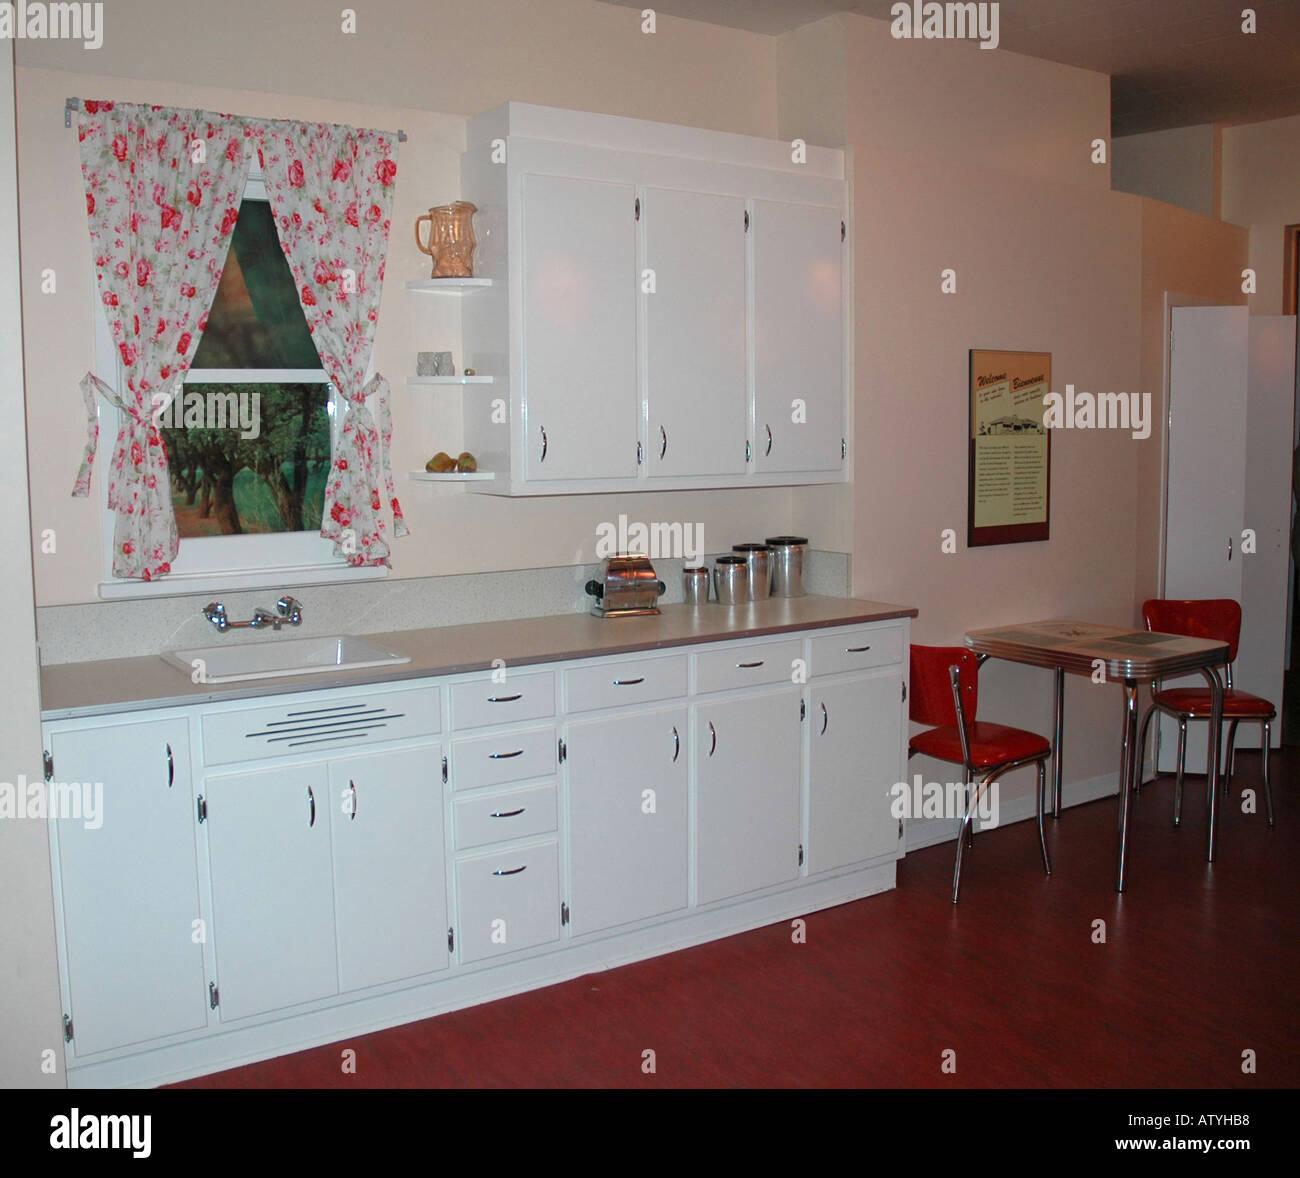 1950 u0027s typical house kitchen exhibit canadian war museum ottawa